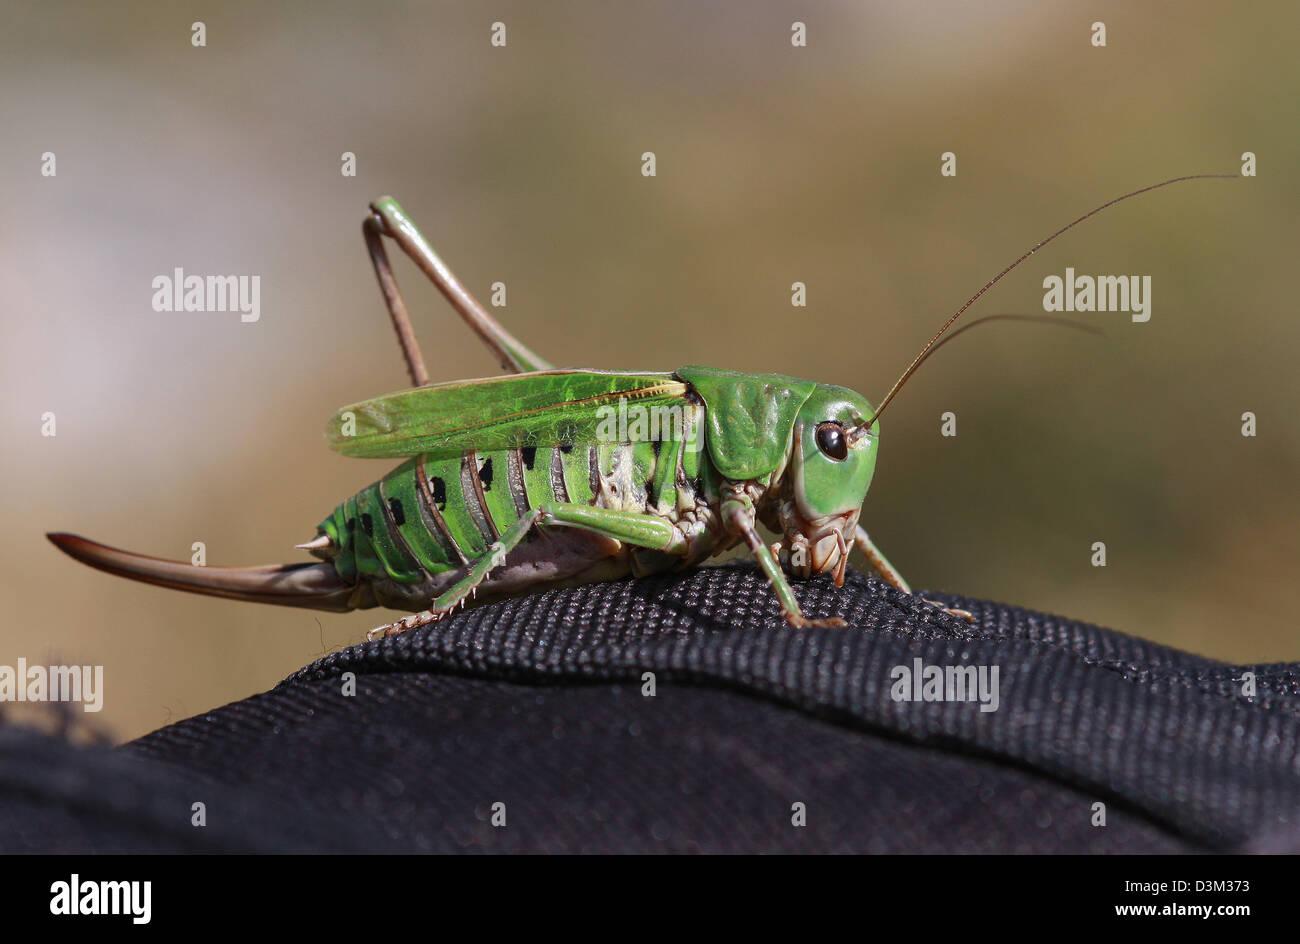 cricket - Stock Image